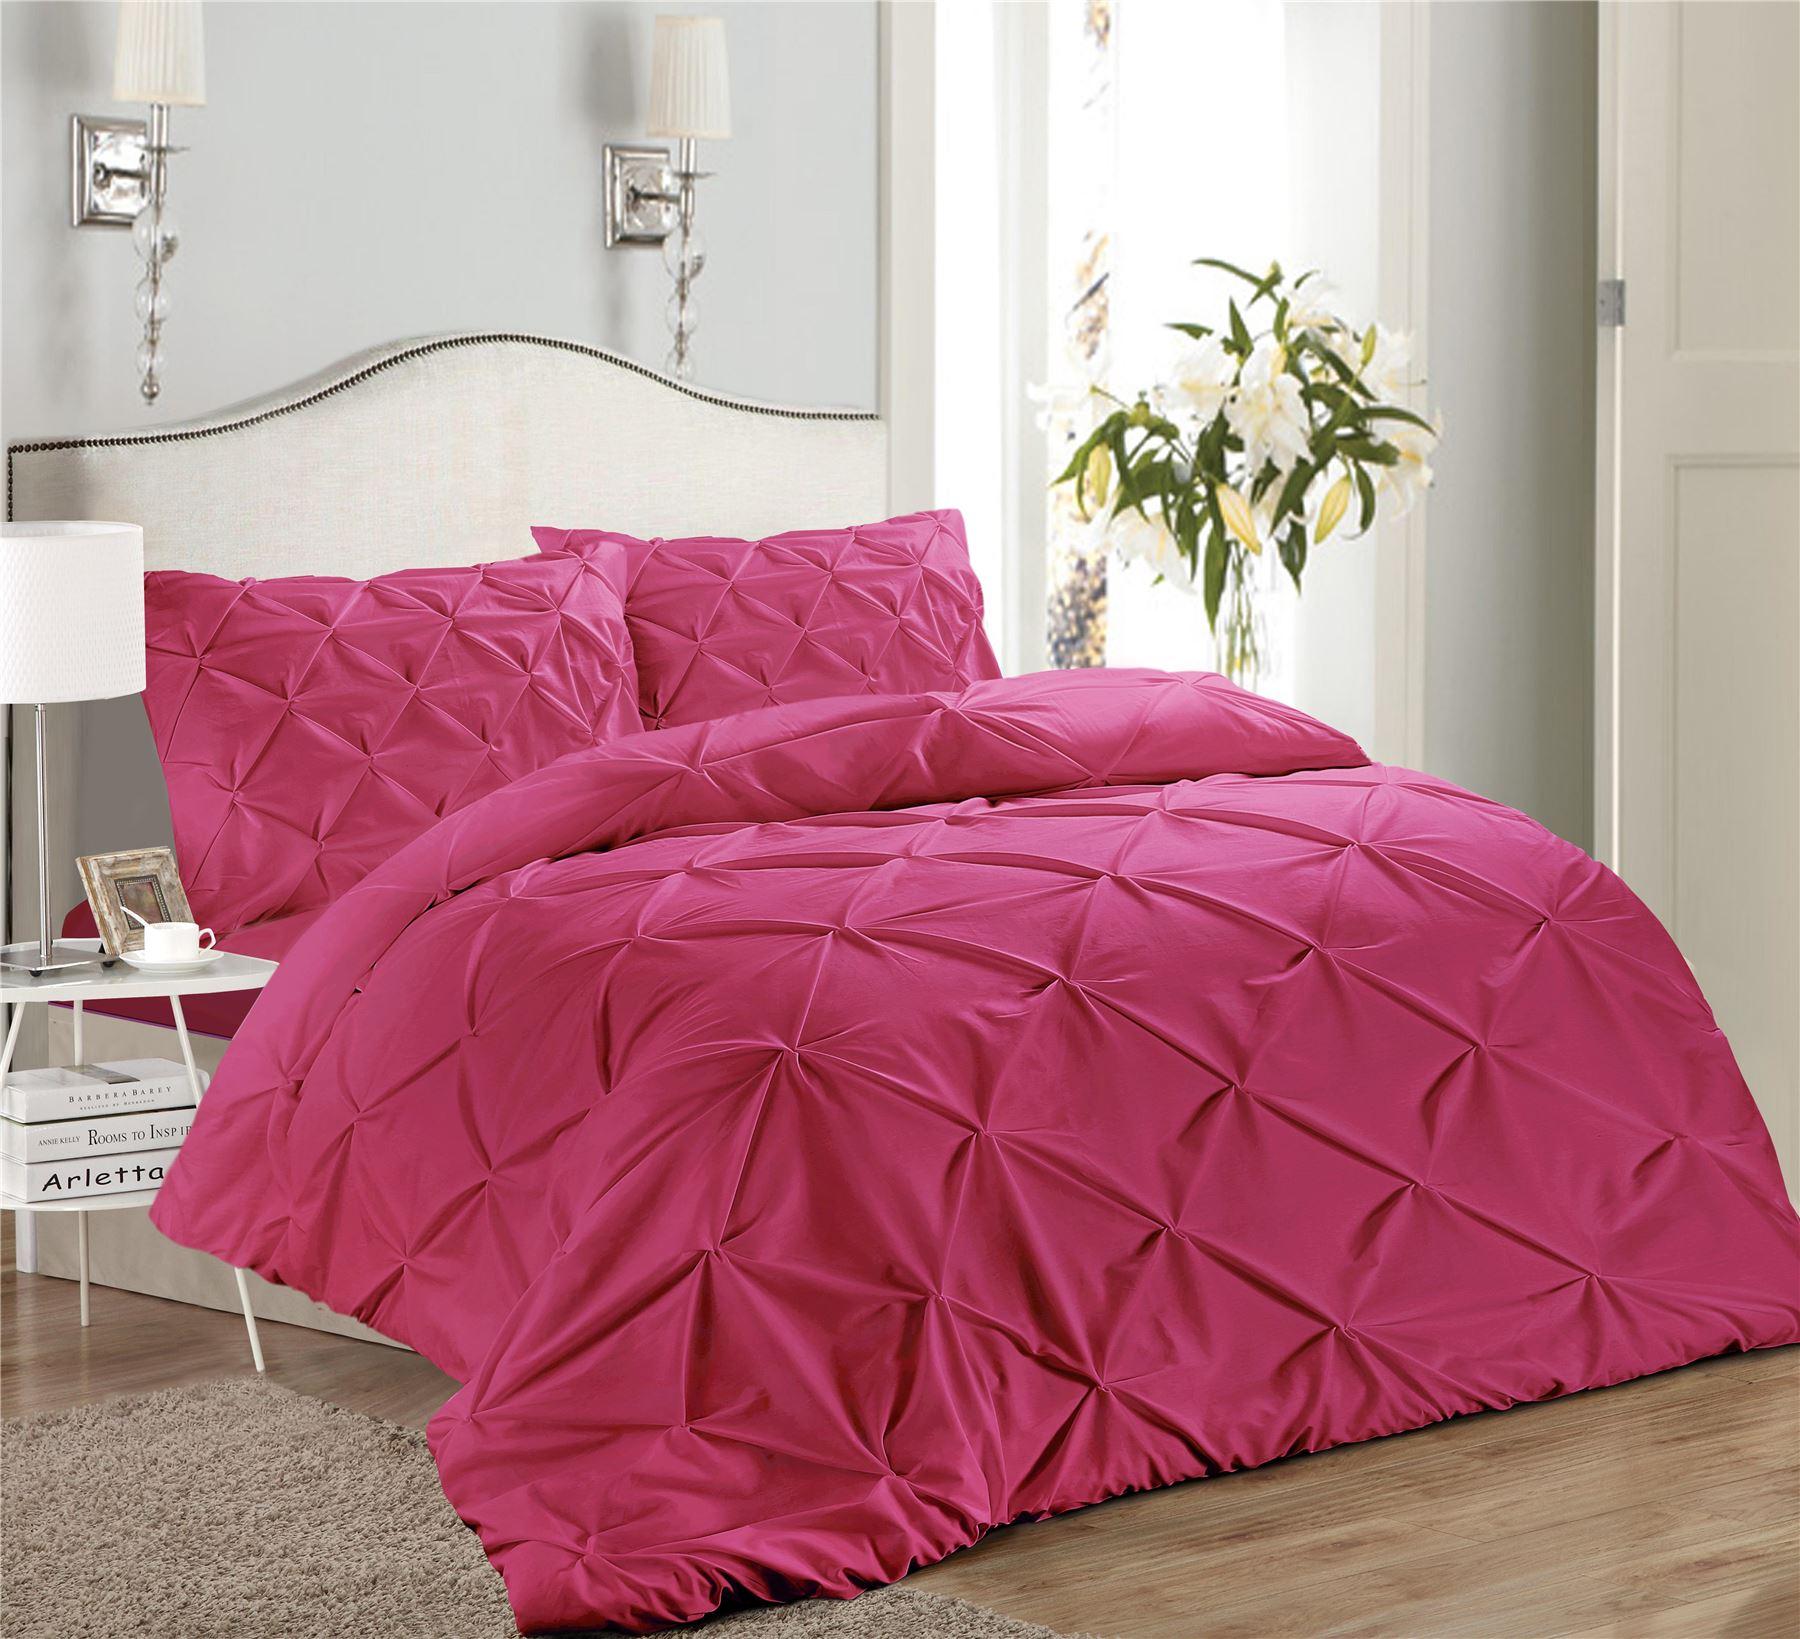 Luxury-Pure-100-Cotton-200-Thread-Pinch-Pleat-Pintuck-Puckering-Duvet-Cover-Set thumbnail 35